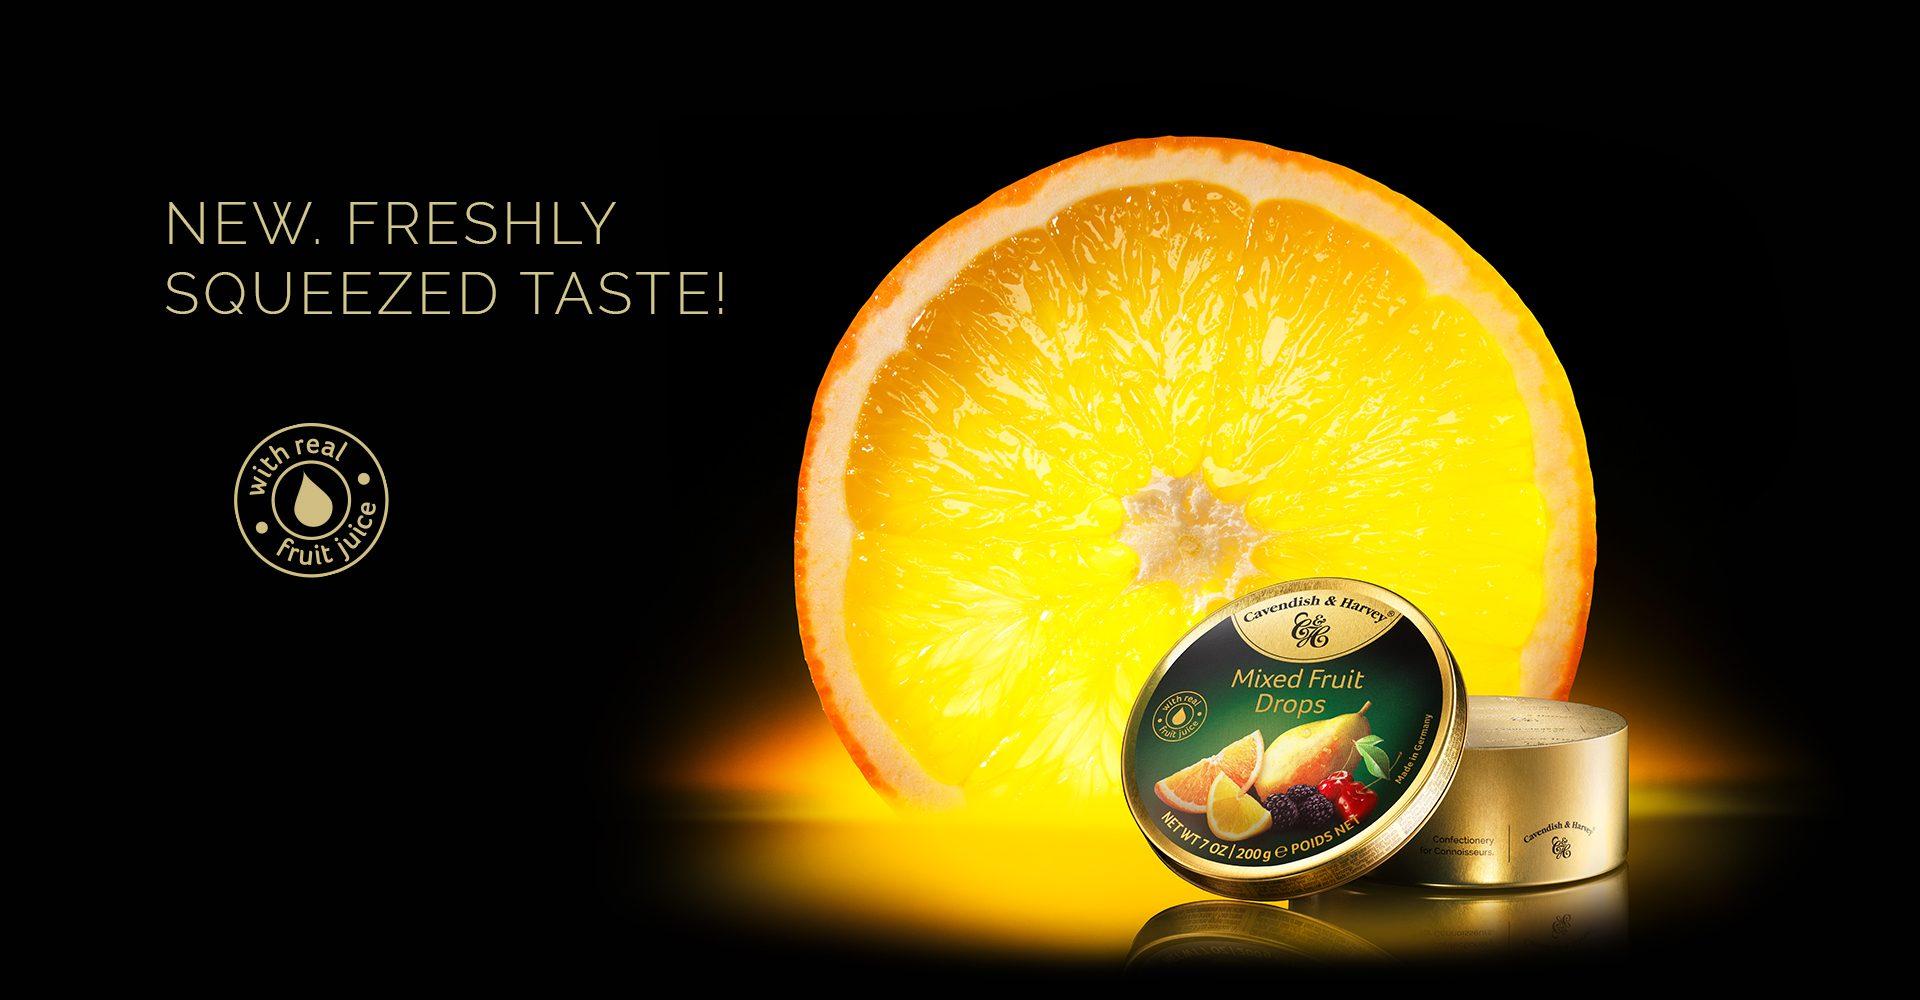 KeyVisual Mixed Fruit